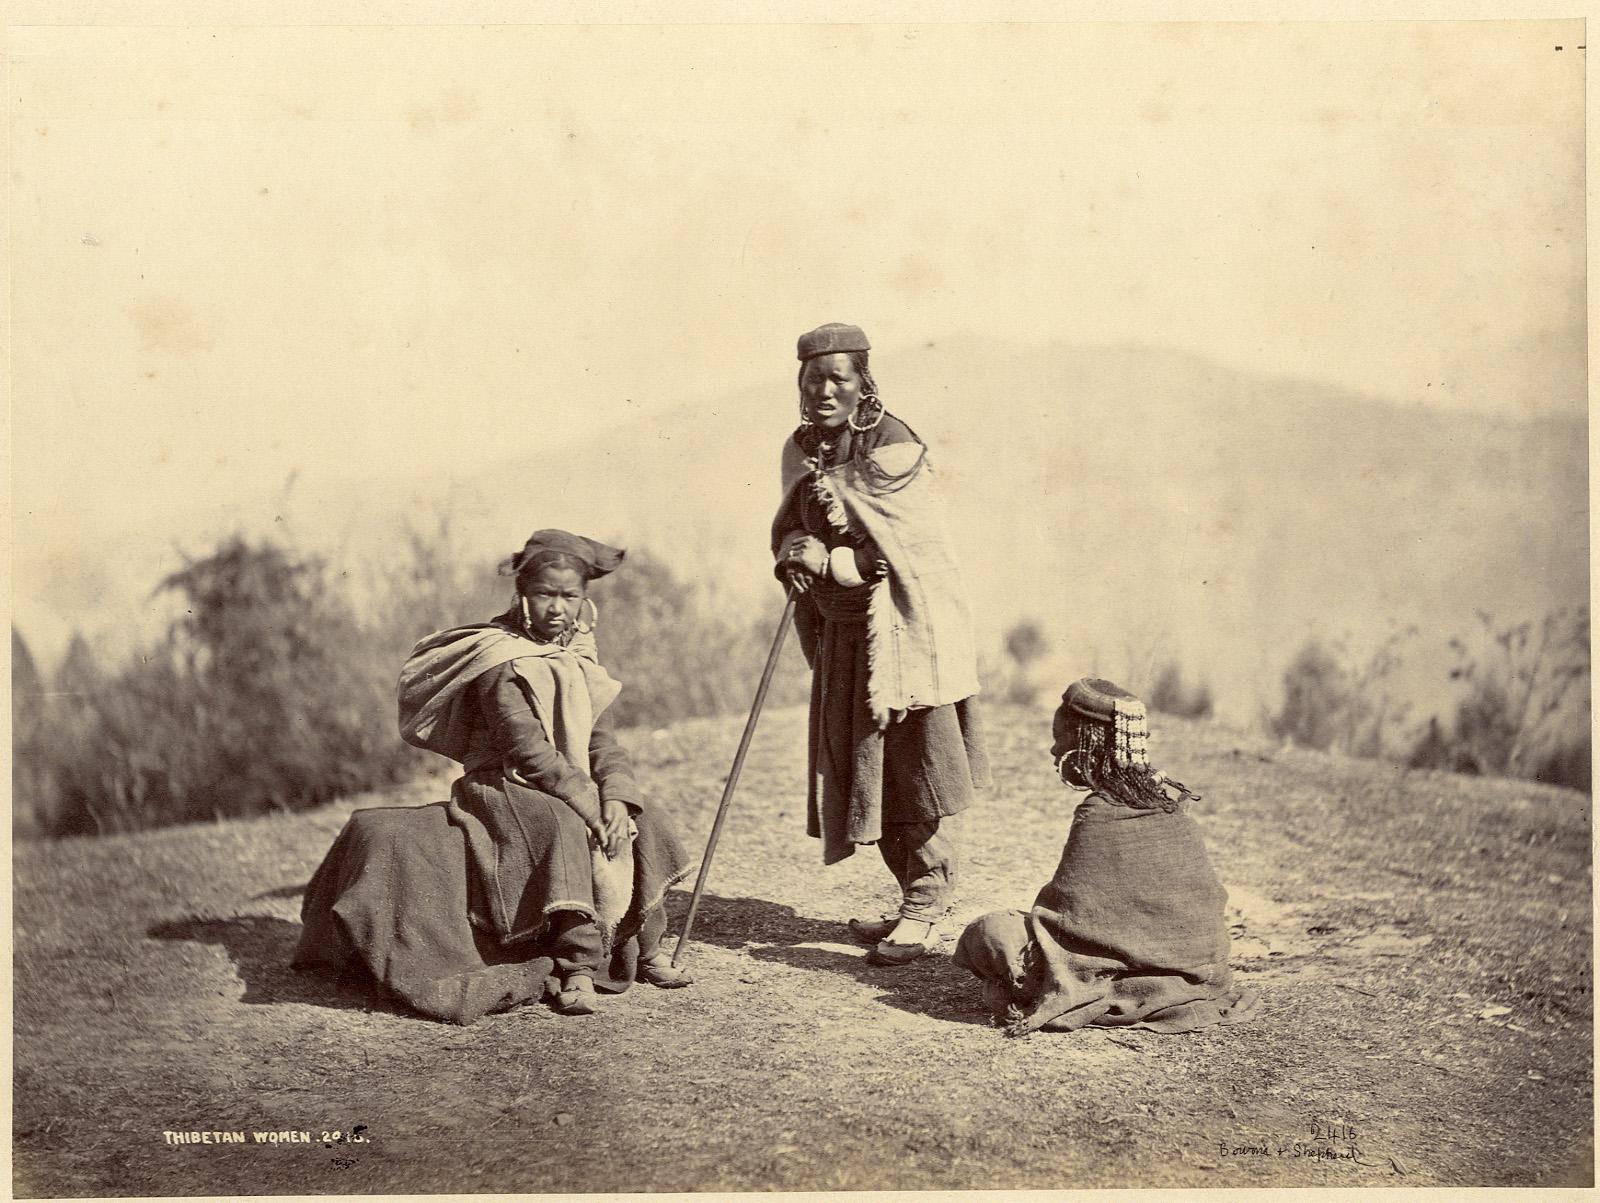 Bourne & Shepherd  Thibetan Women